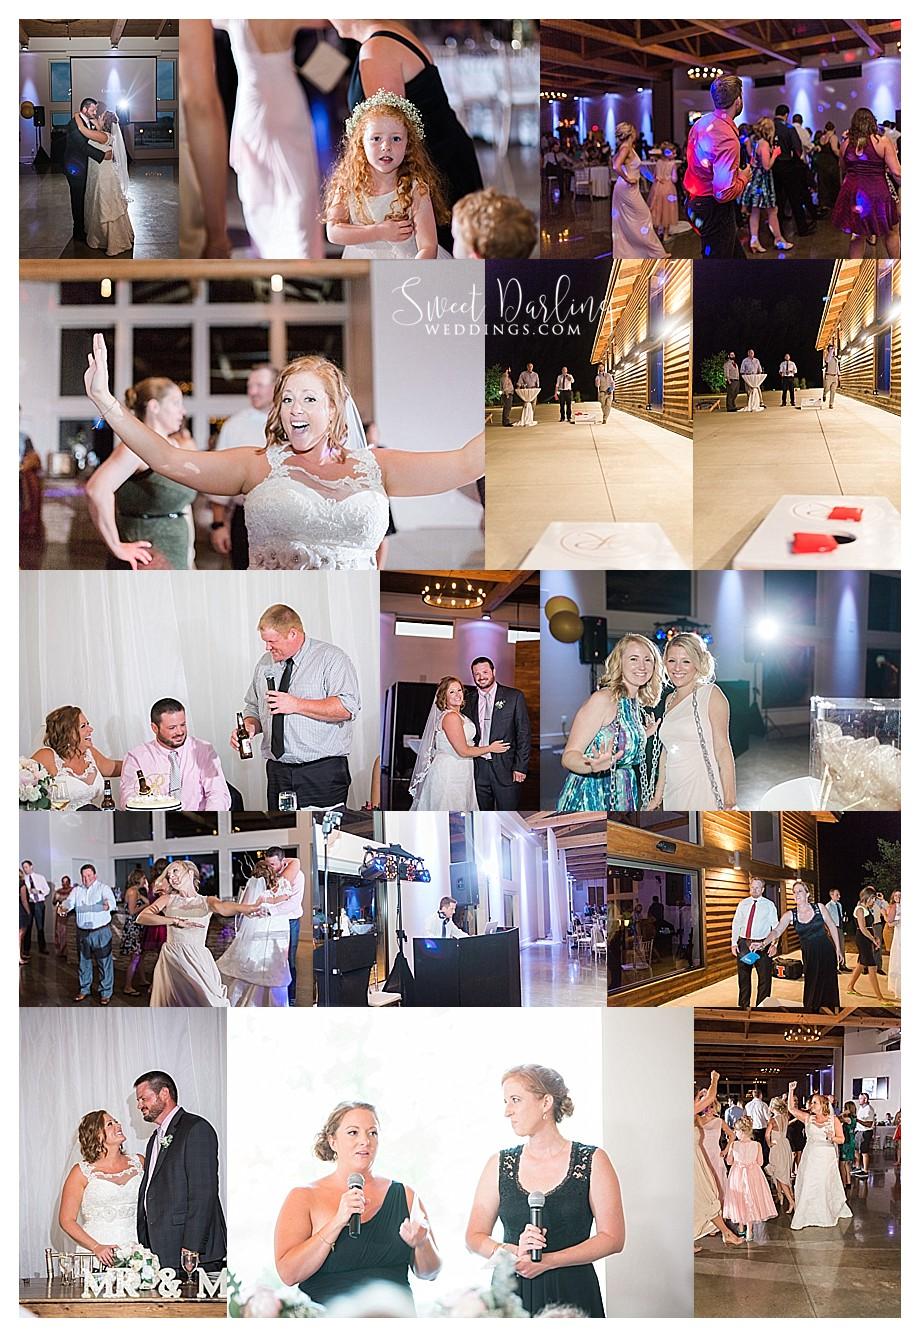 Dancing at Pear Tree wedding reception